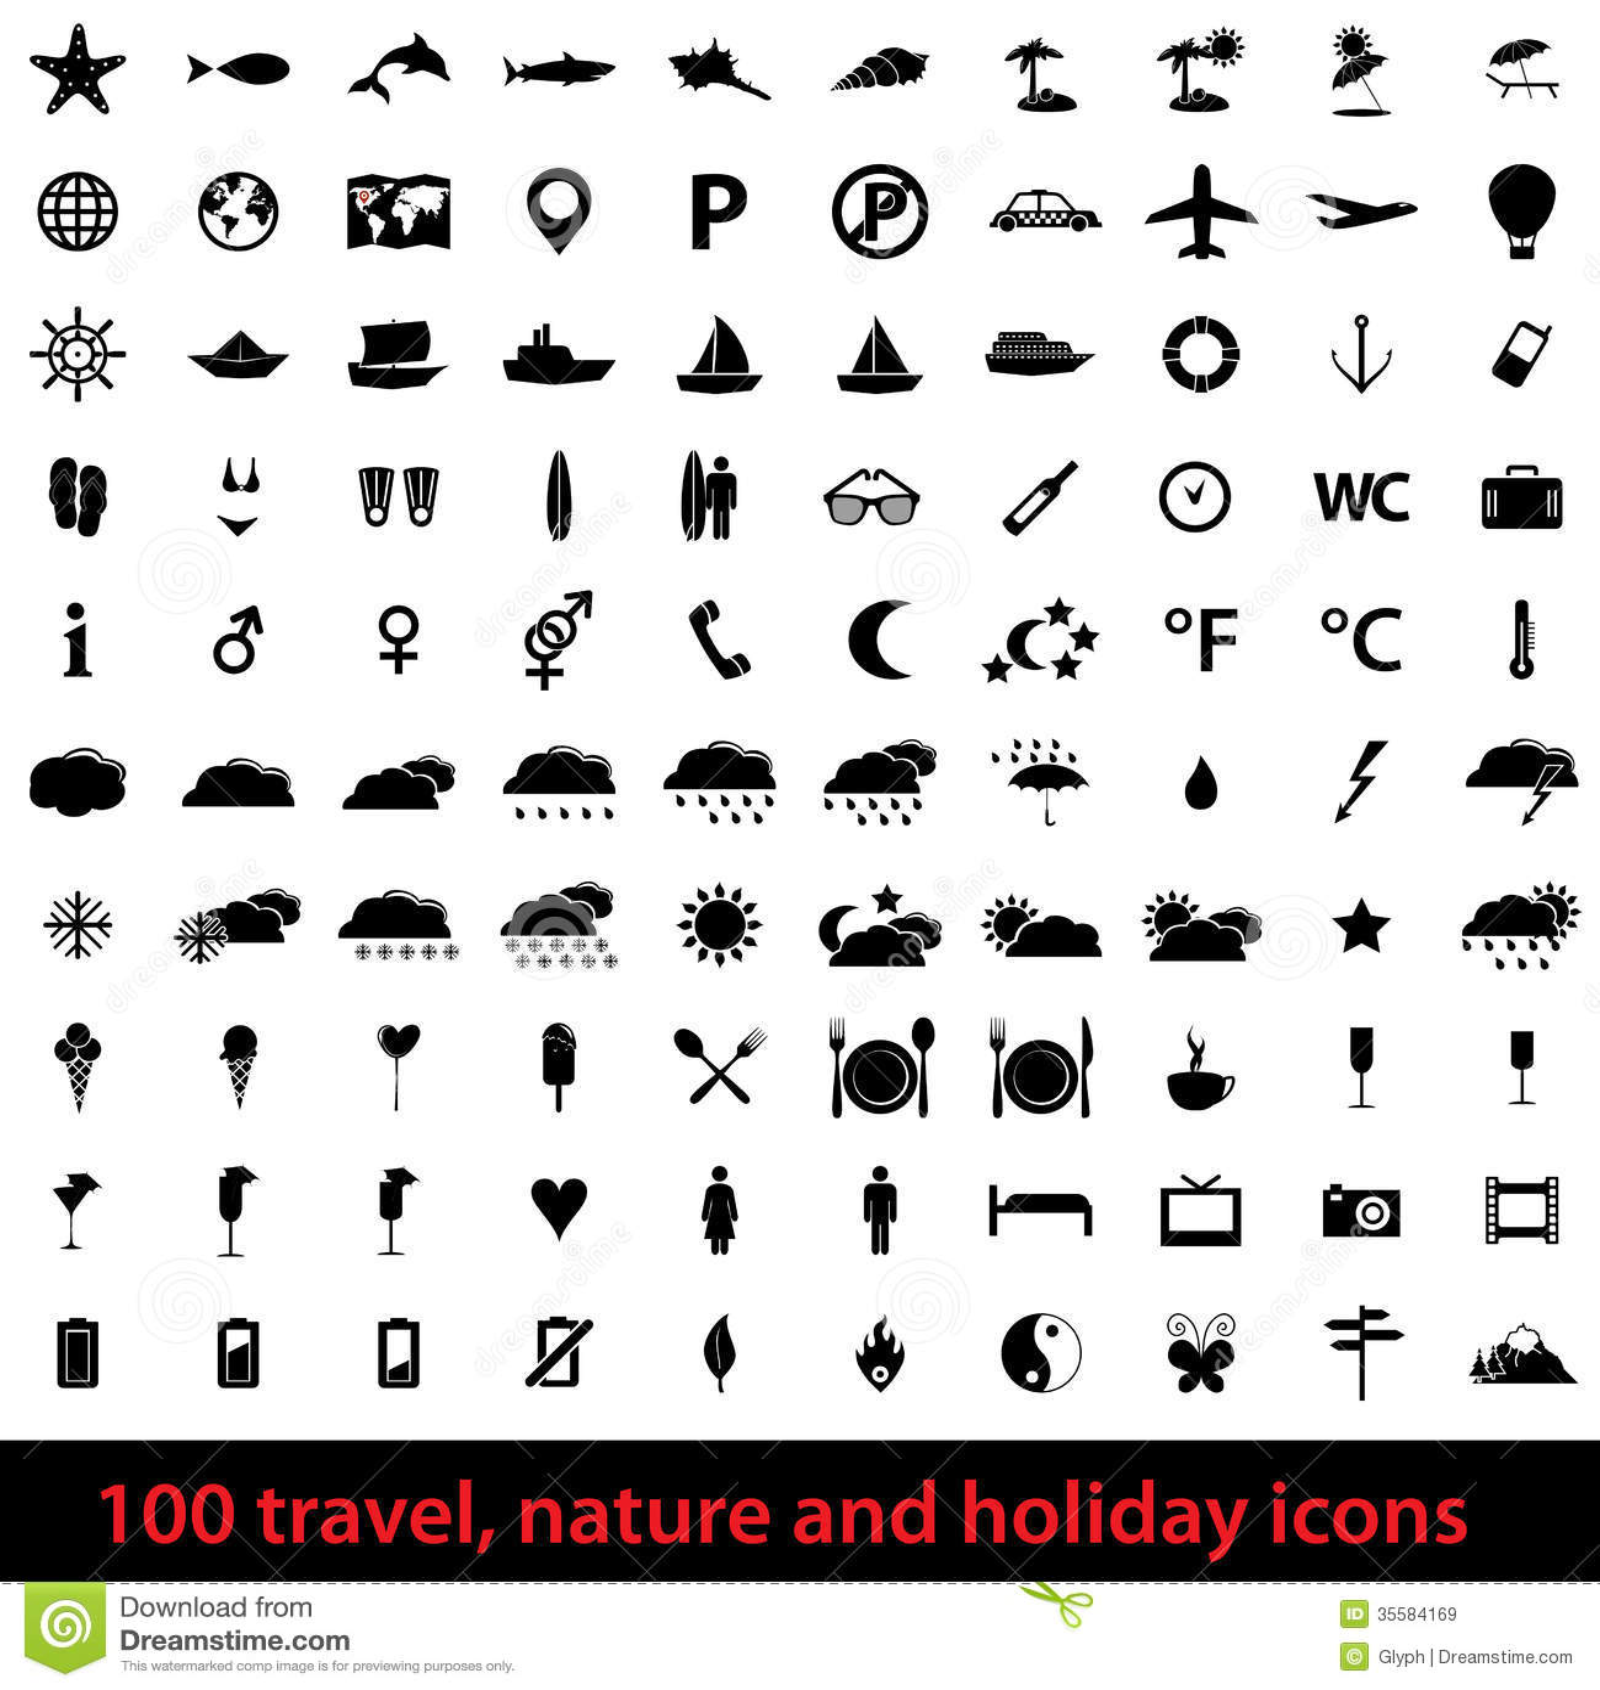 Large Set Of Holiday Icons Royalty Free Stock Images - Image: 35584169